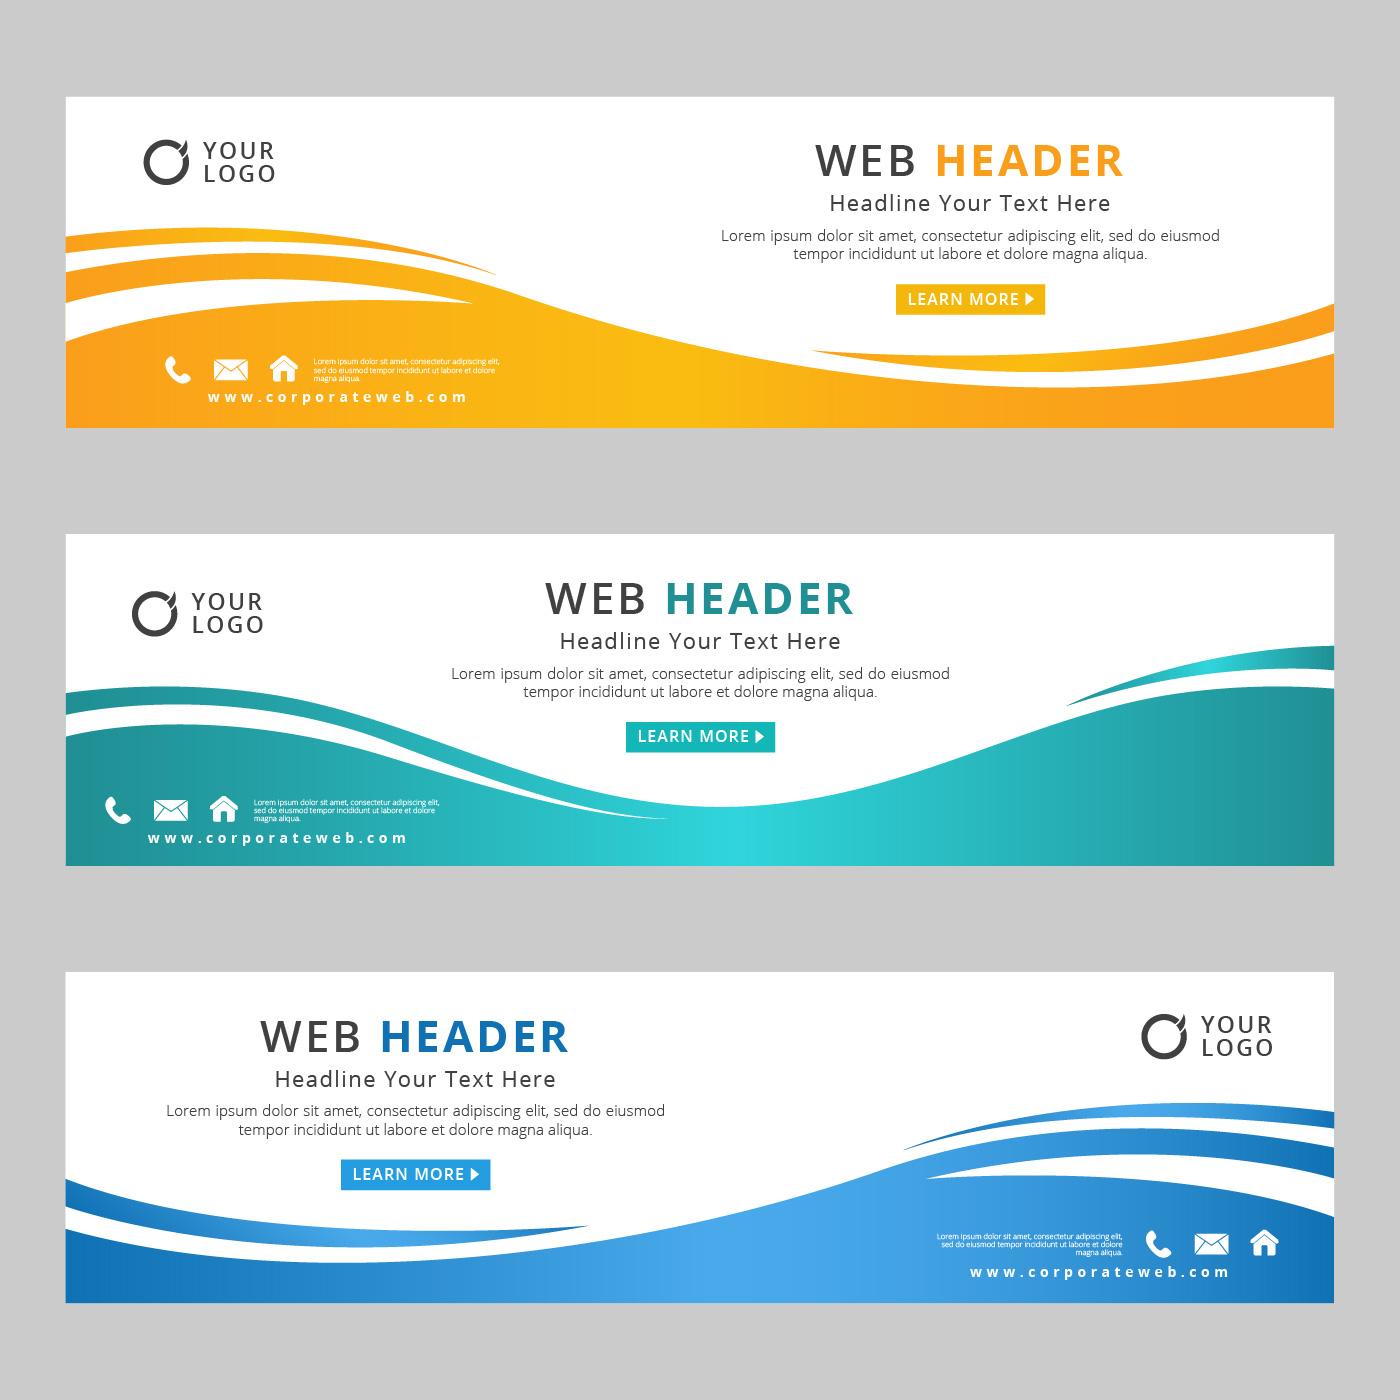 Vector Illustration Web Designs: Abstract Corporate Web Header